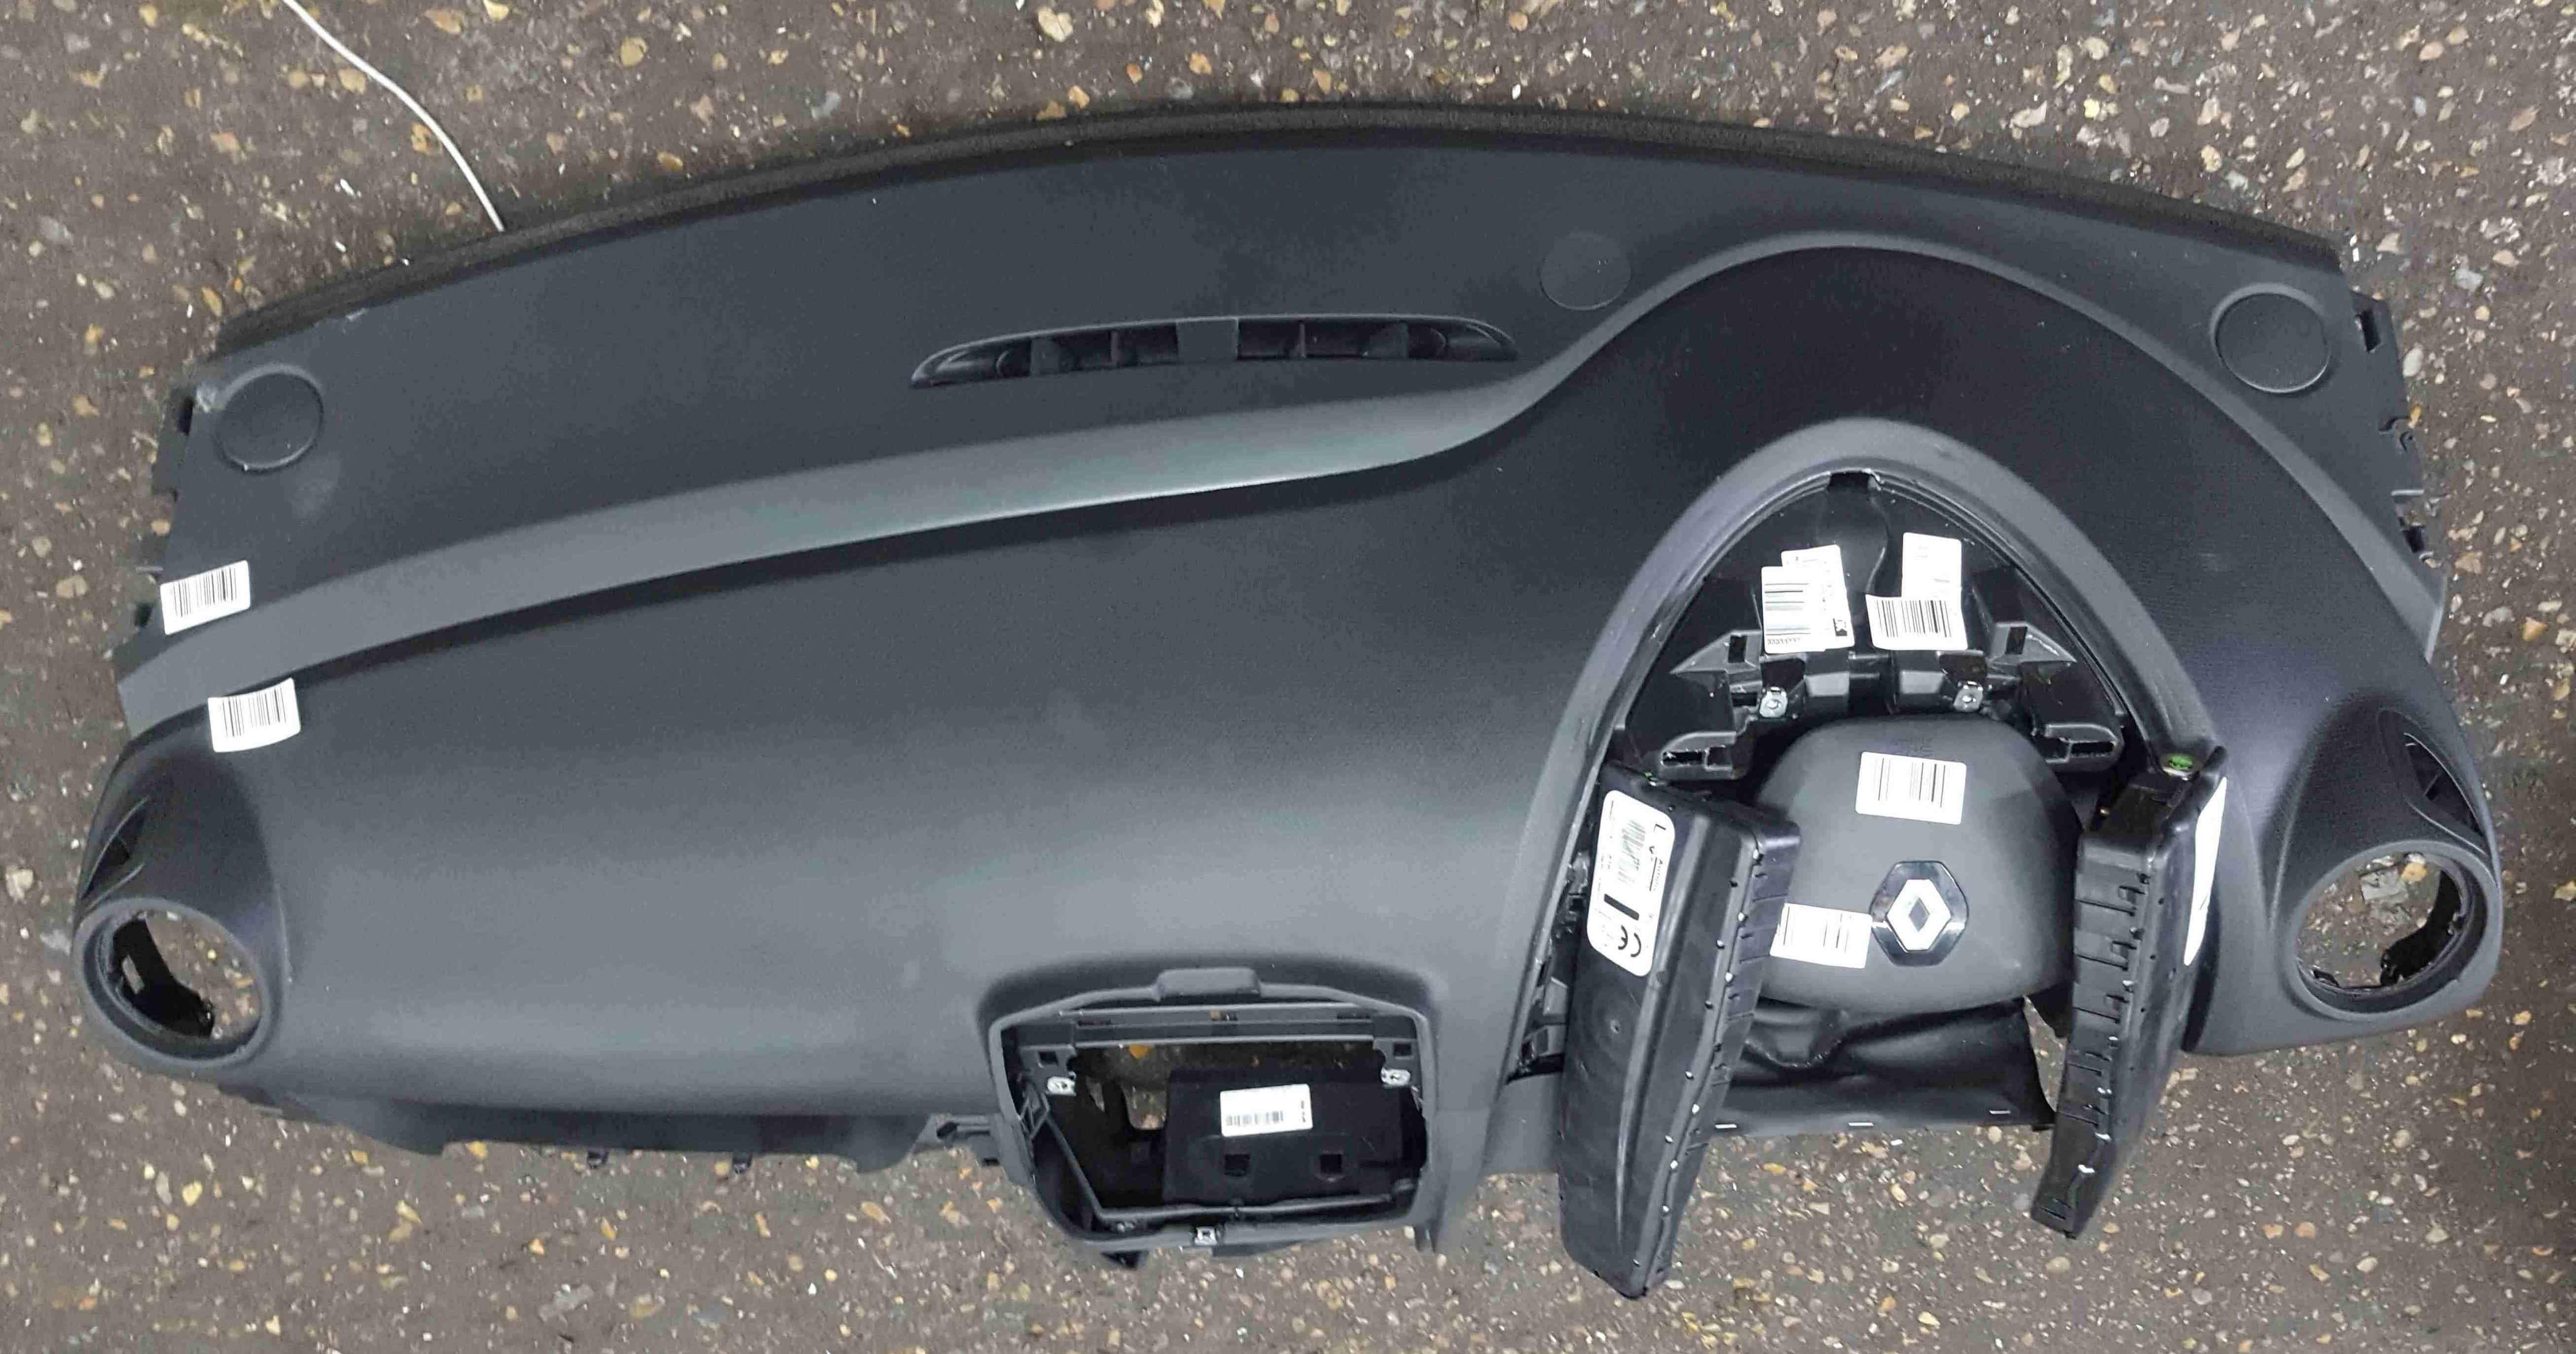 Renault Clio MK4 2013-2019 Main Dashboard Airbag Kit 985H16834R